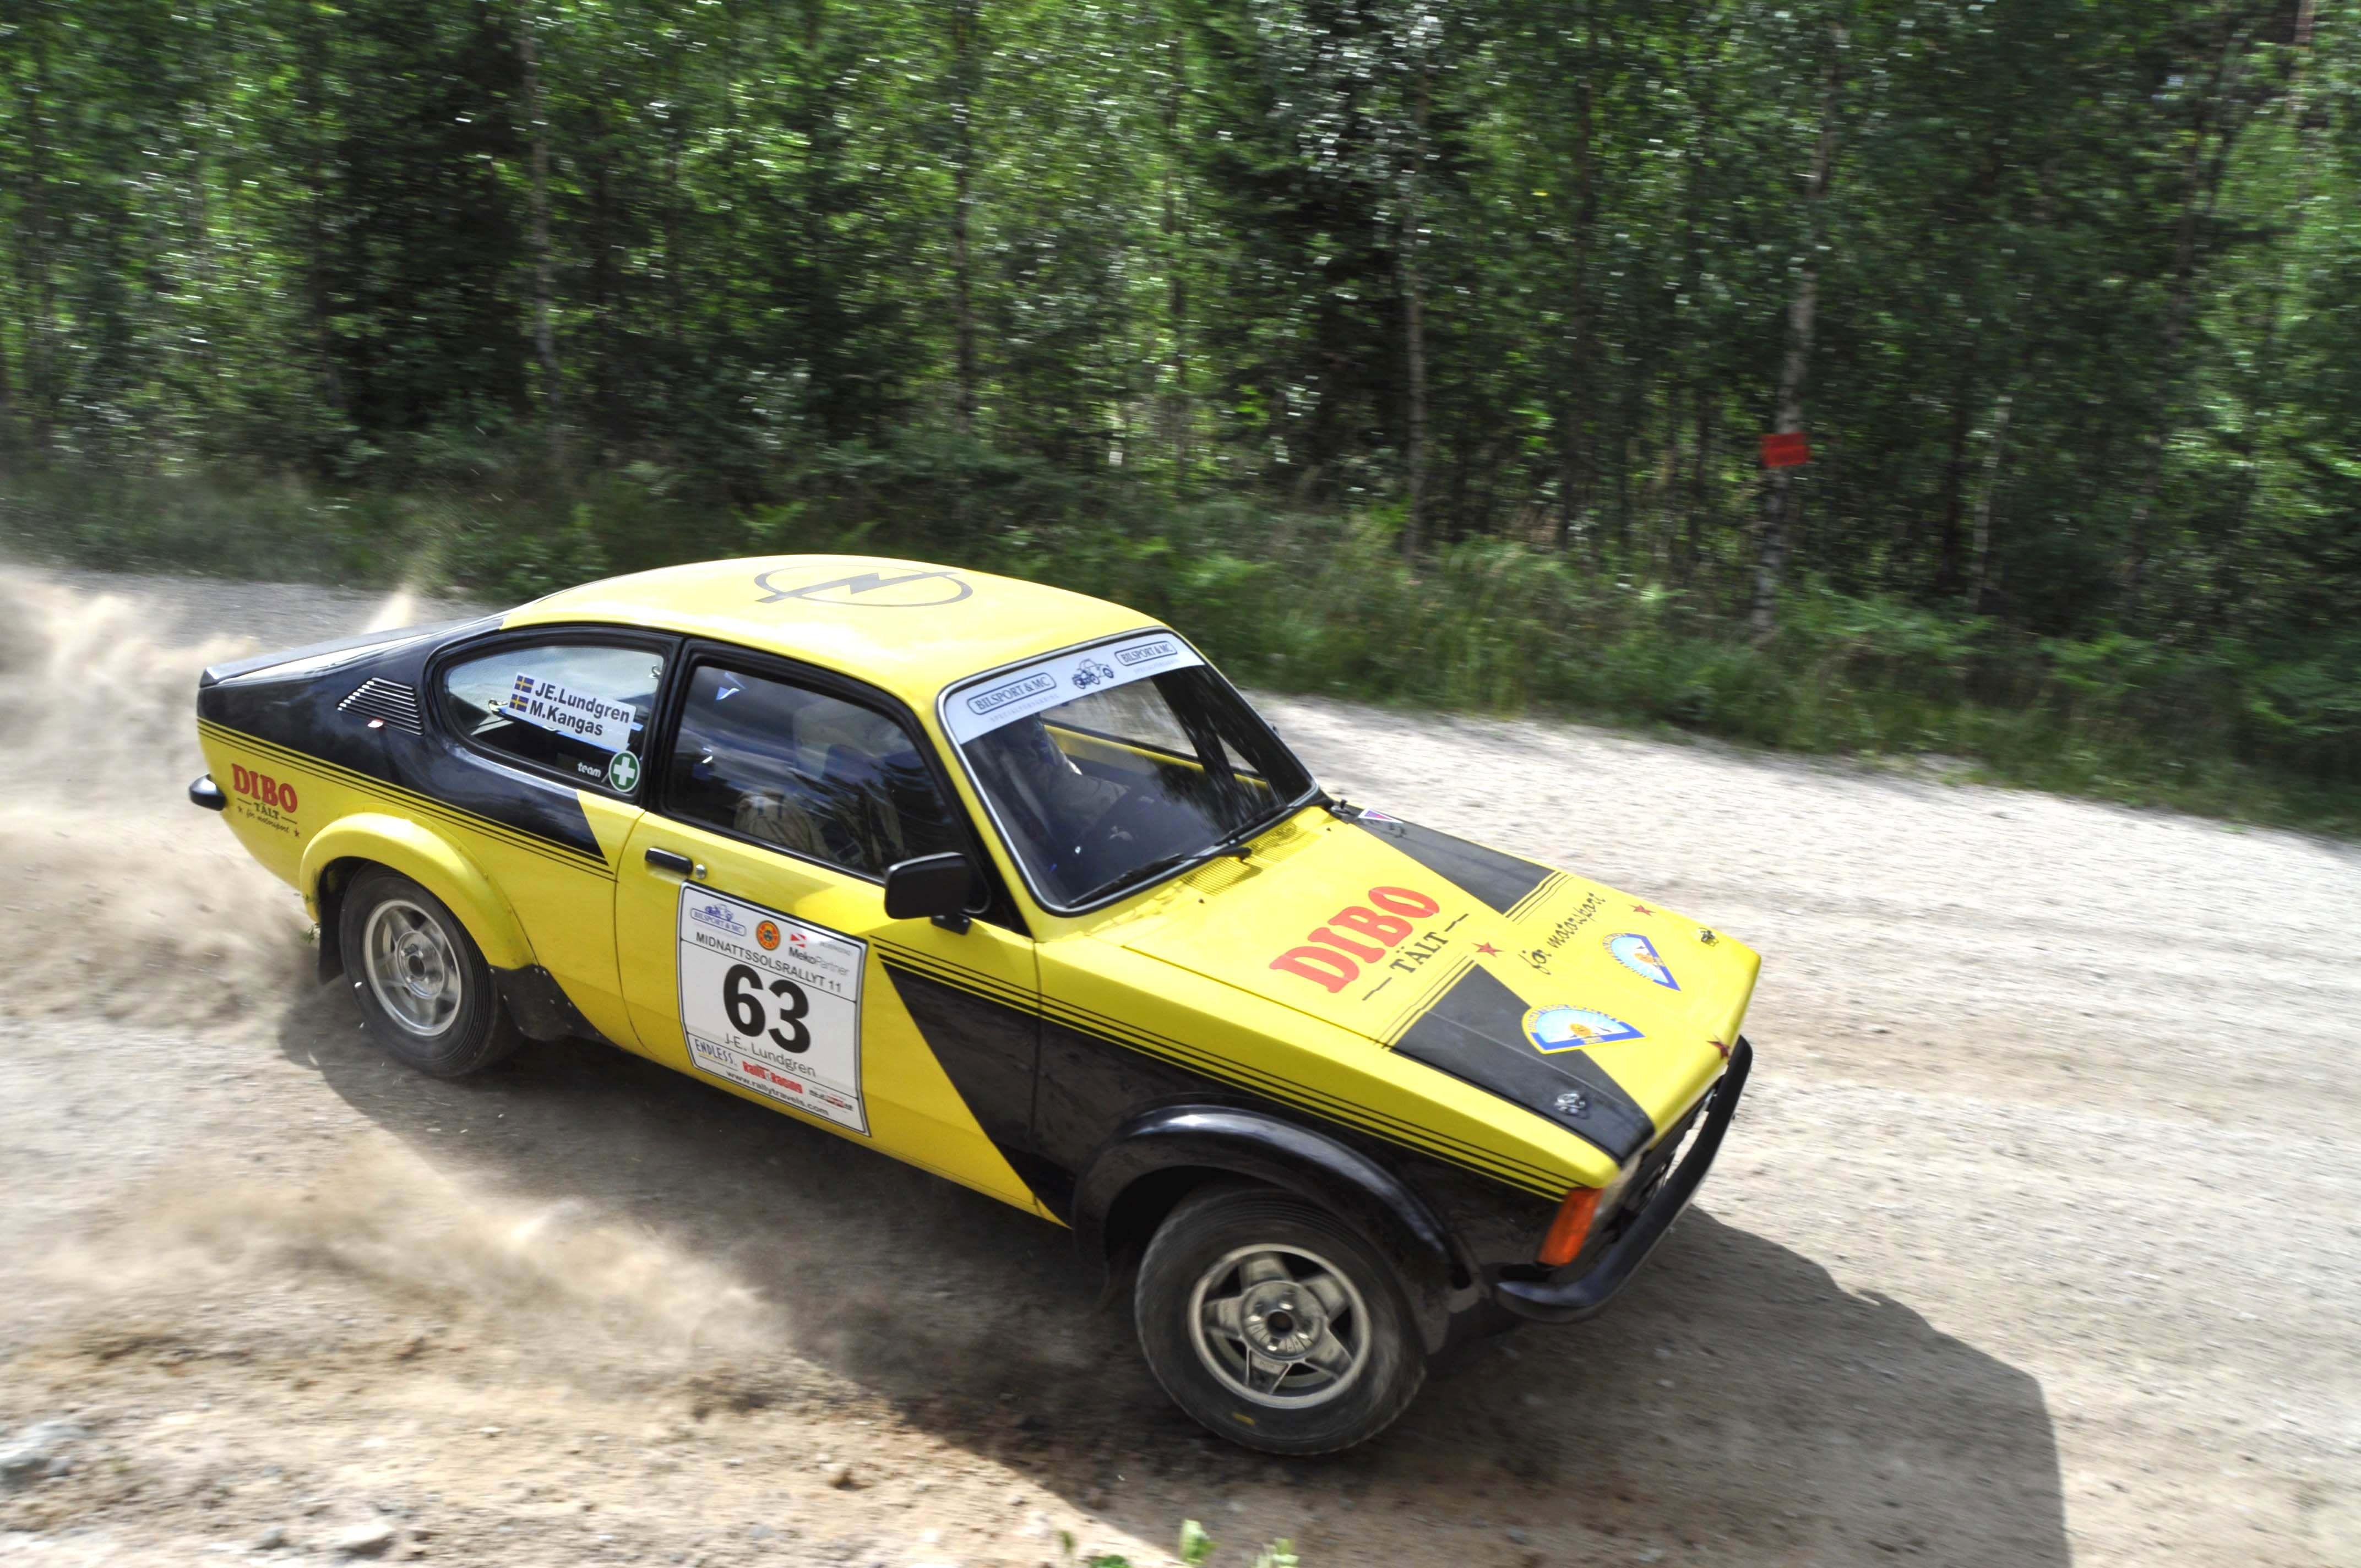 Opel kadett c safari rally replica opel kadett c in de autosport pinterest rally car and cars